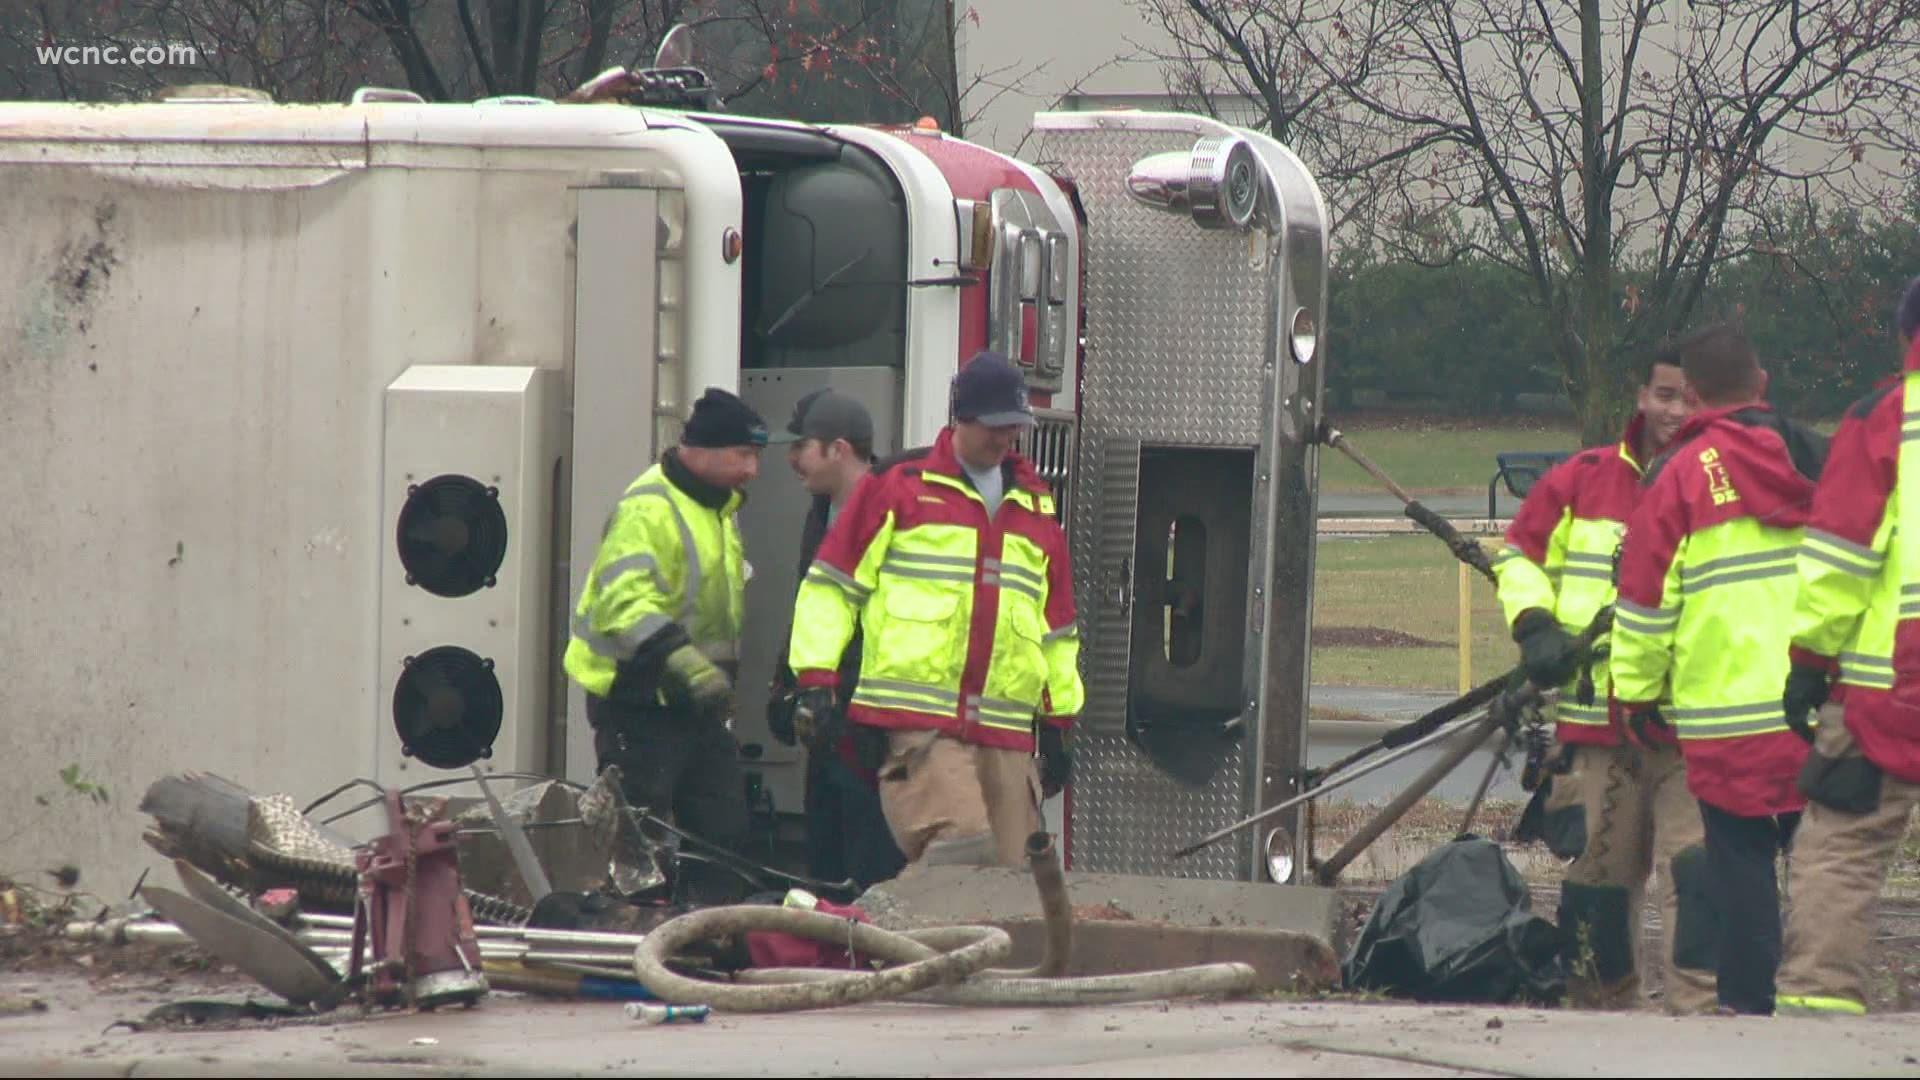 Fireman Taken To The Hospital After Firetruck Rolls Over